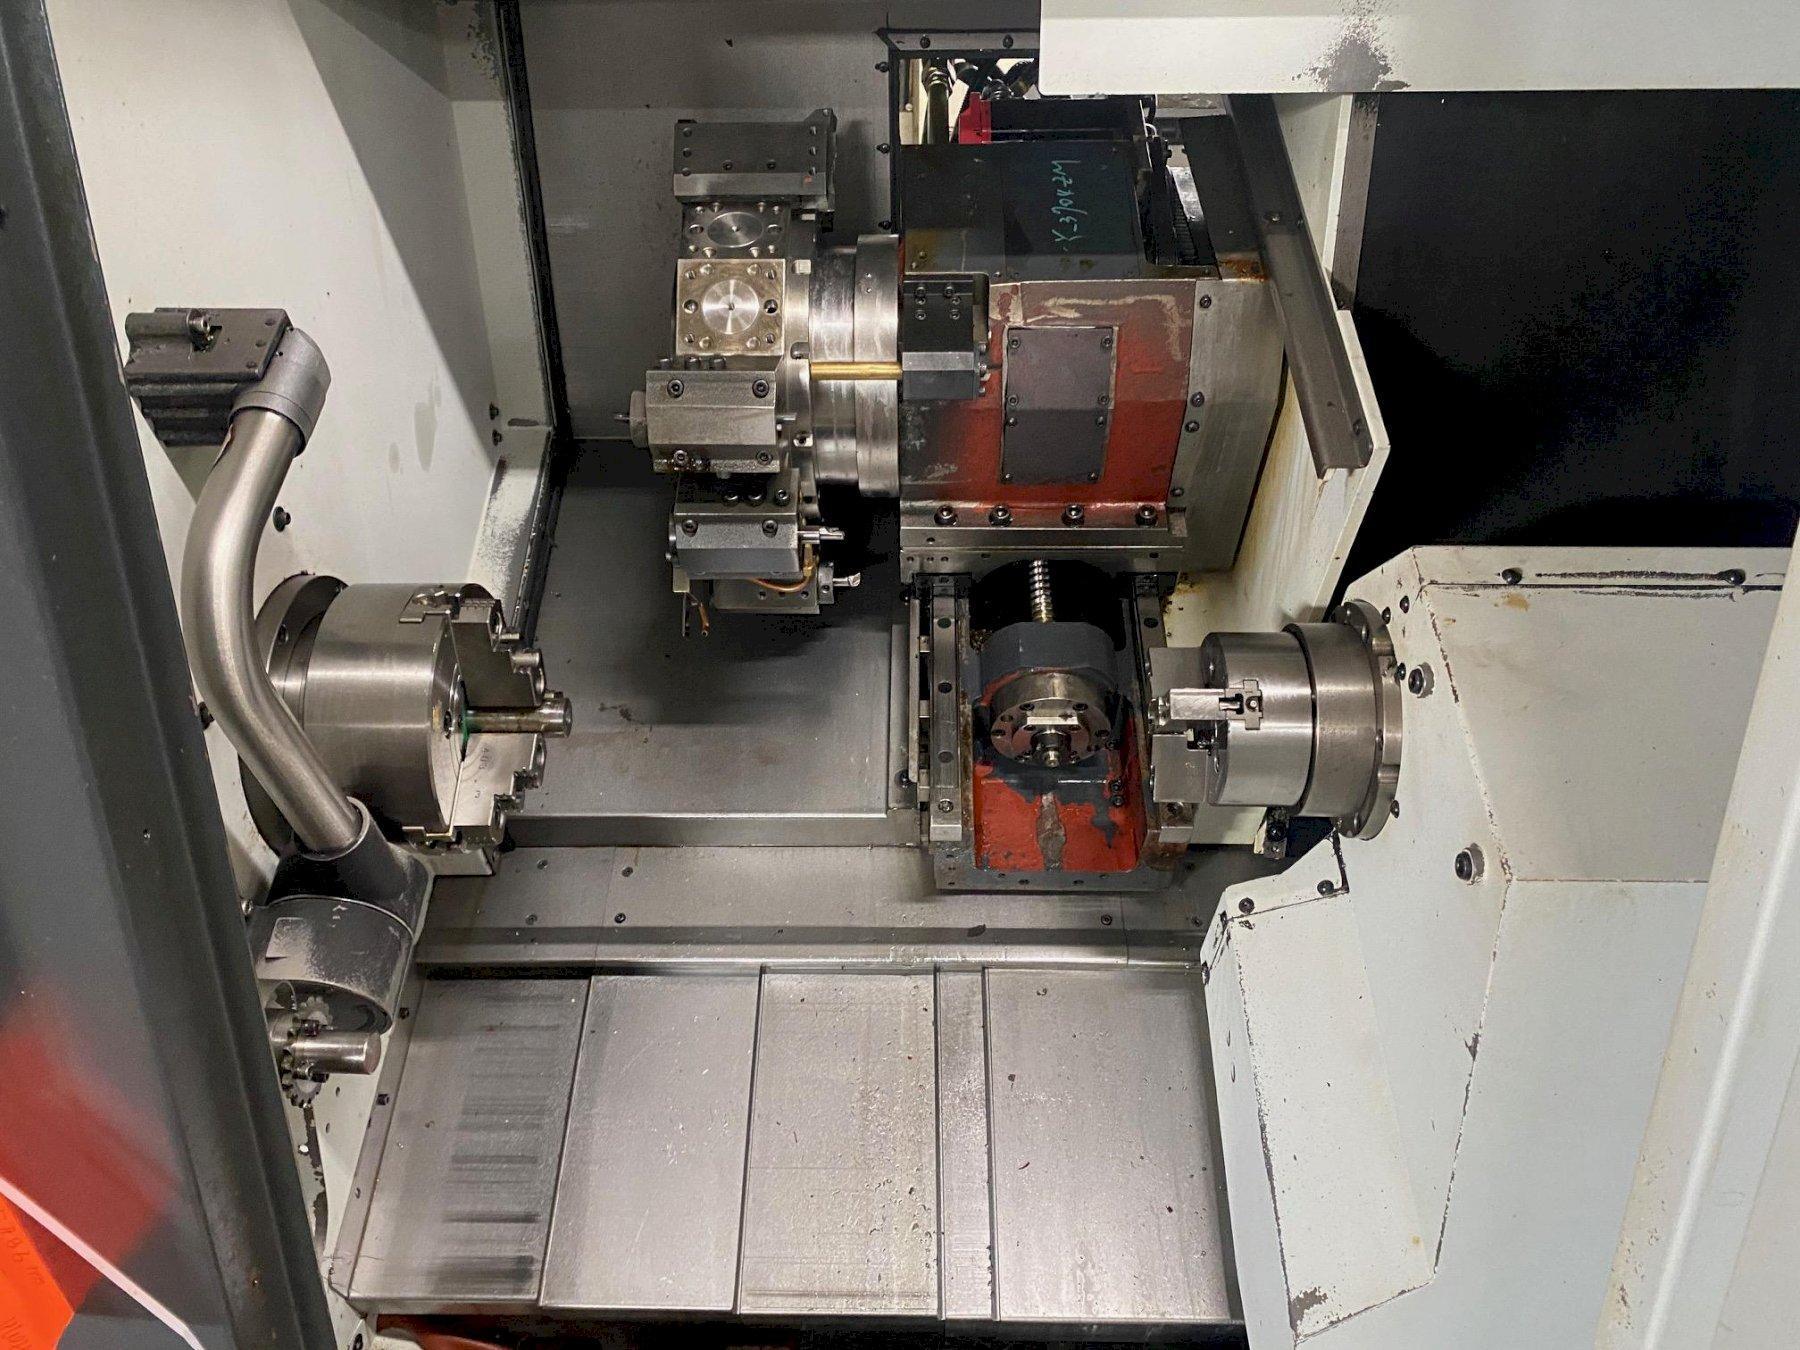 Yama Seiki GLS-2000LMS CNC Horizontal Lathe